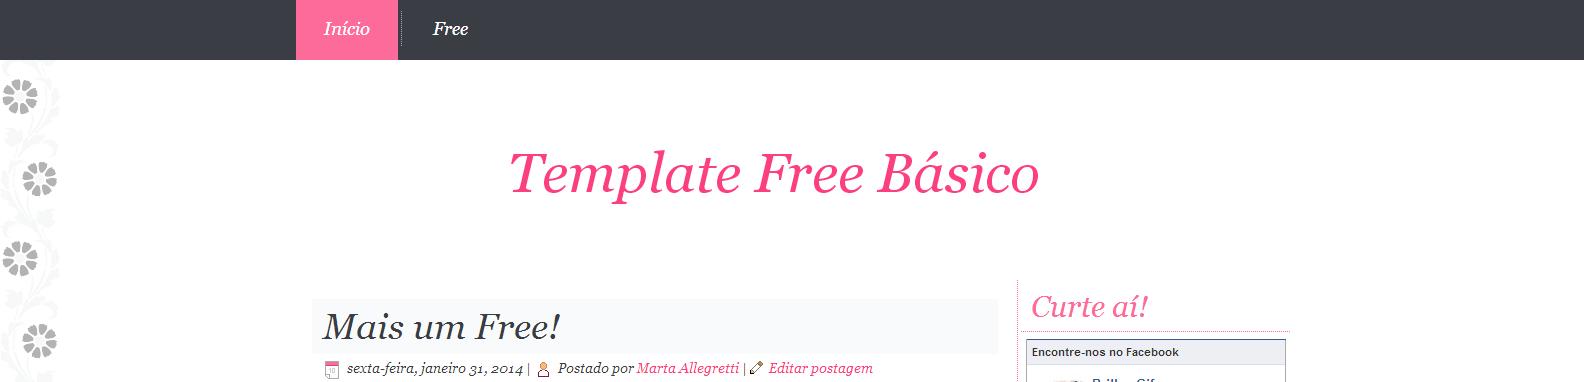 www.blogandolivre.com.br